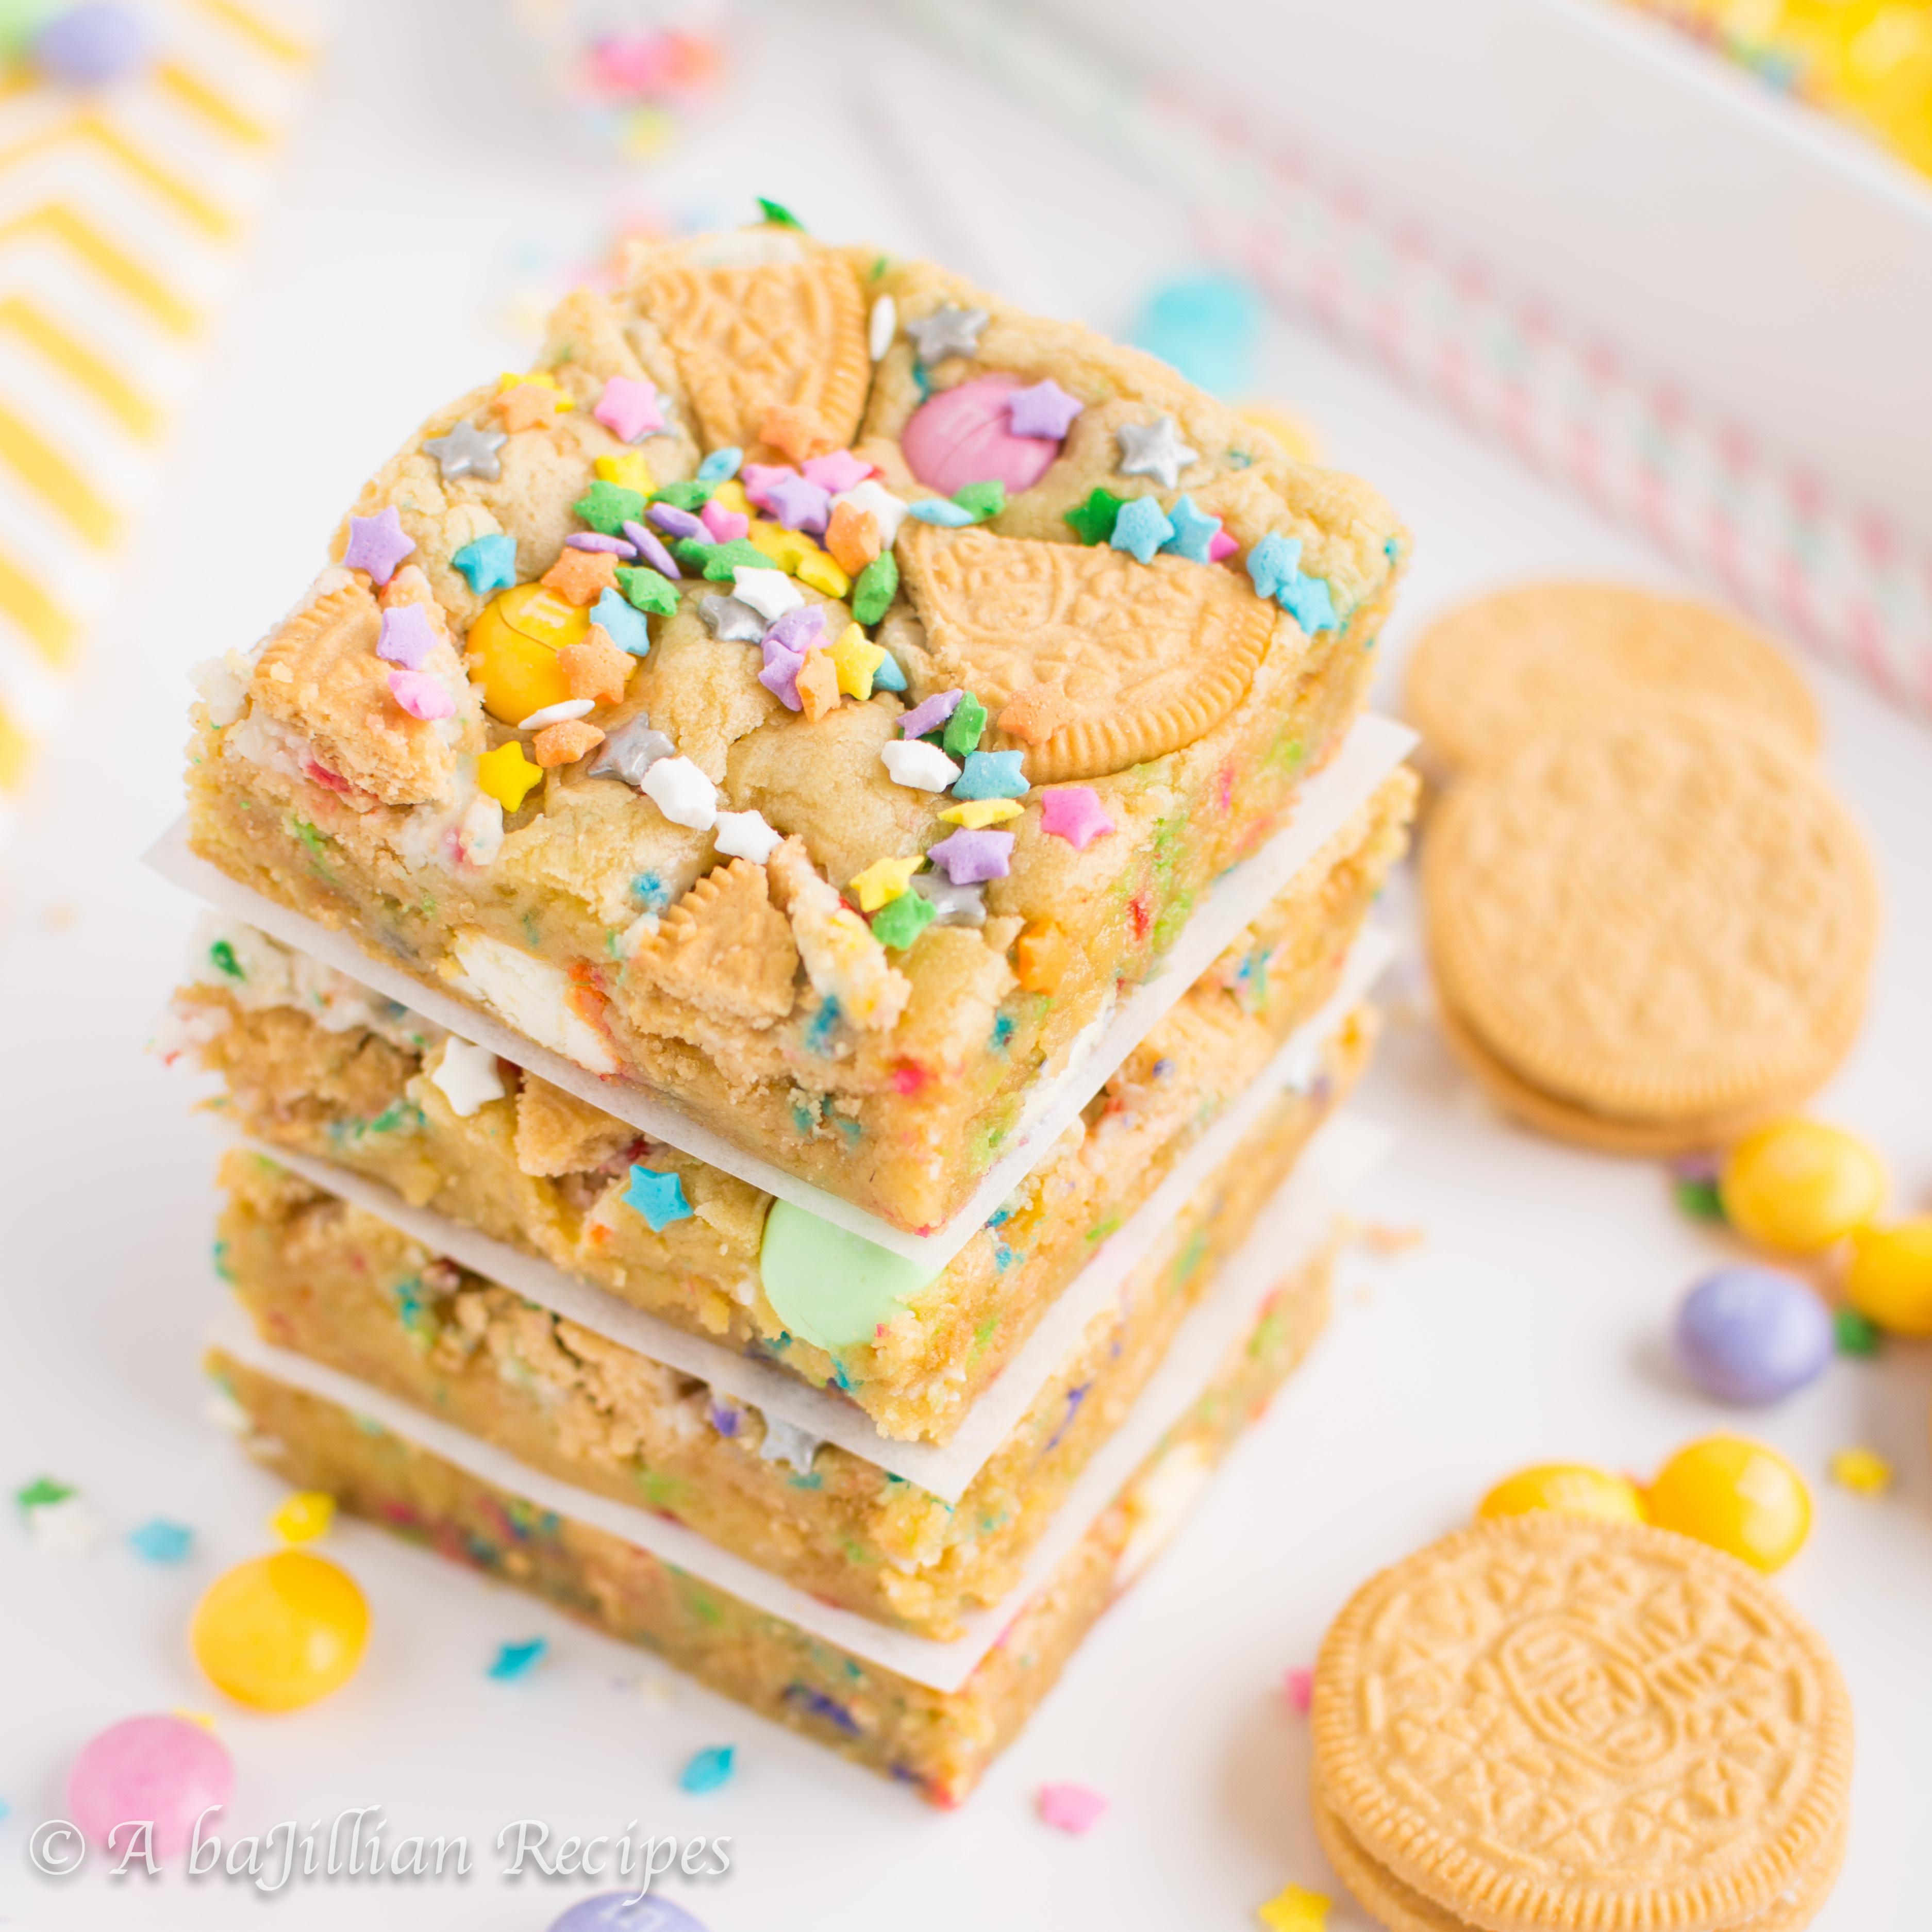 Cake Batter Flavored Recipes